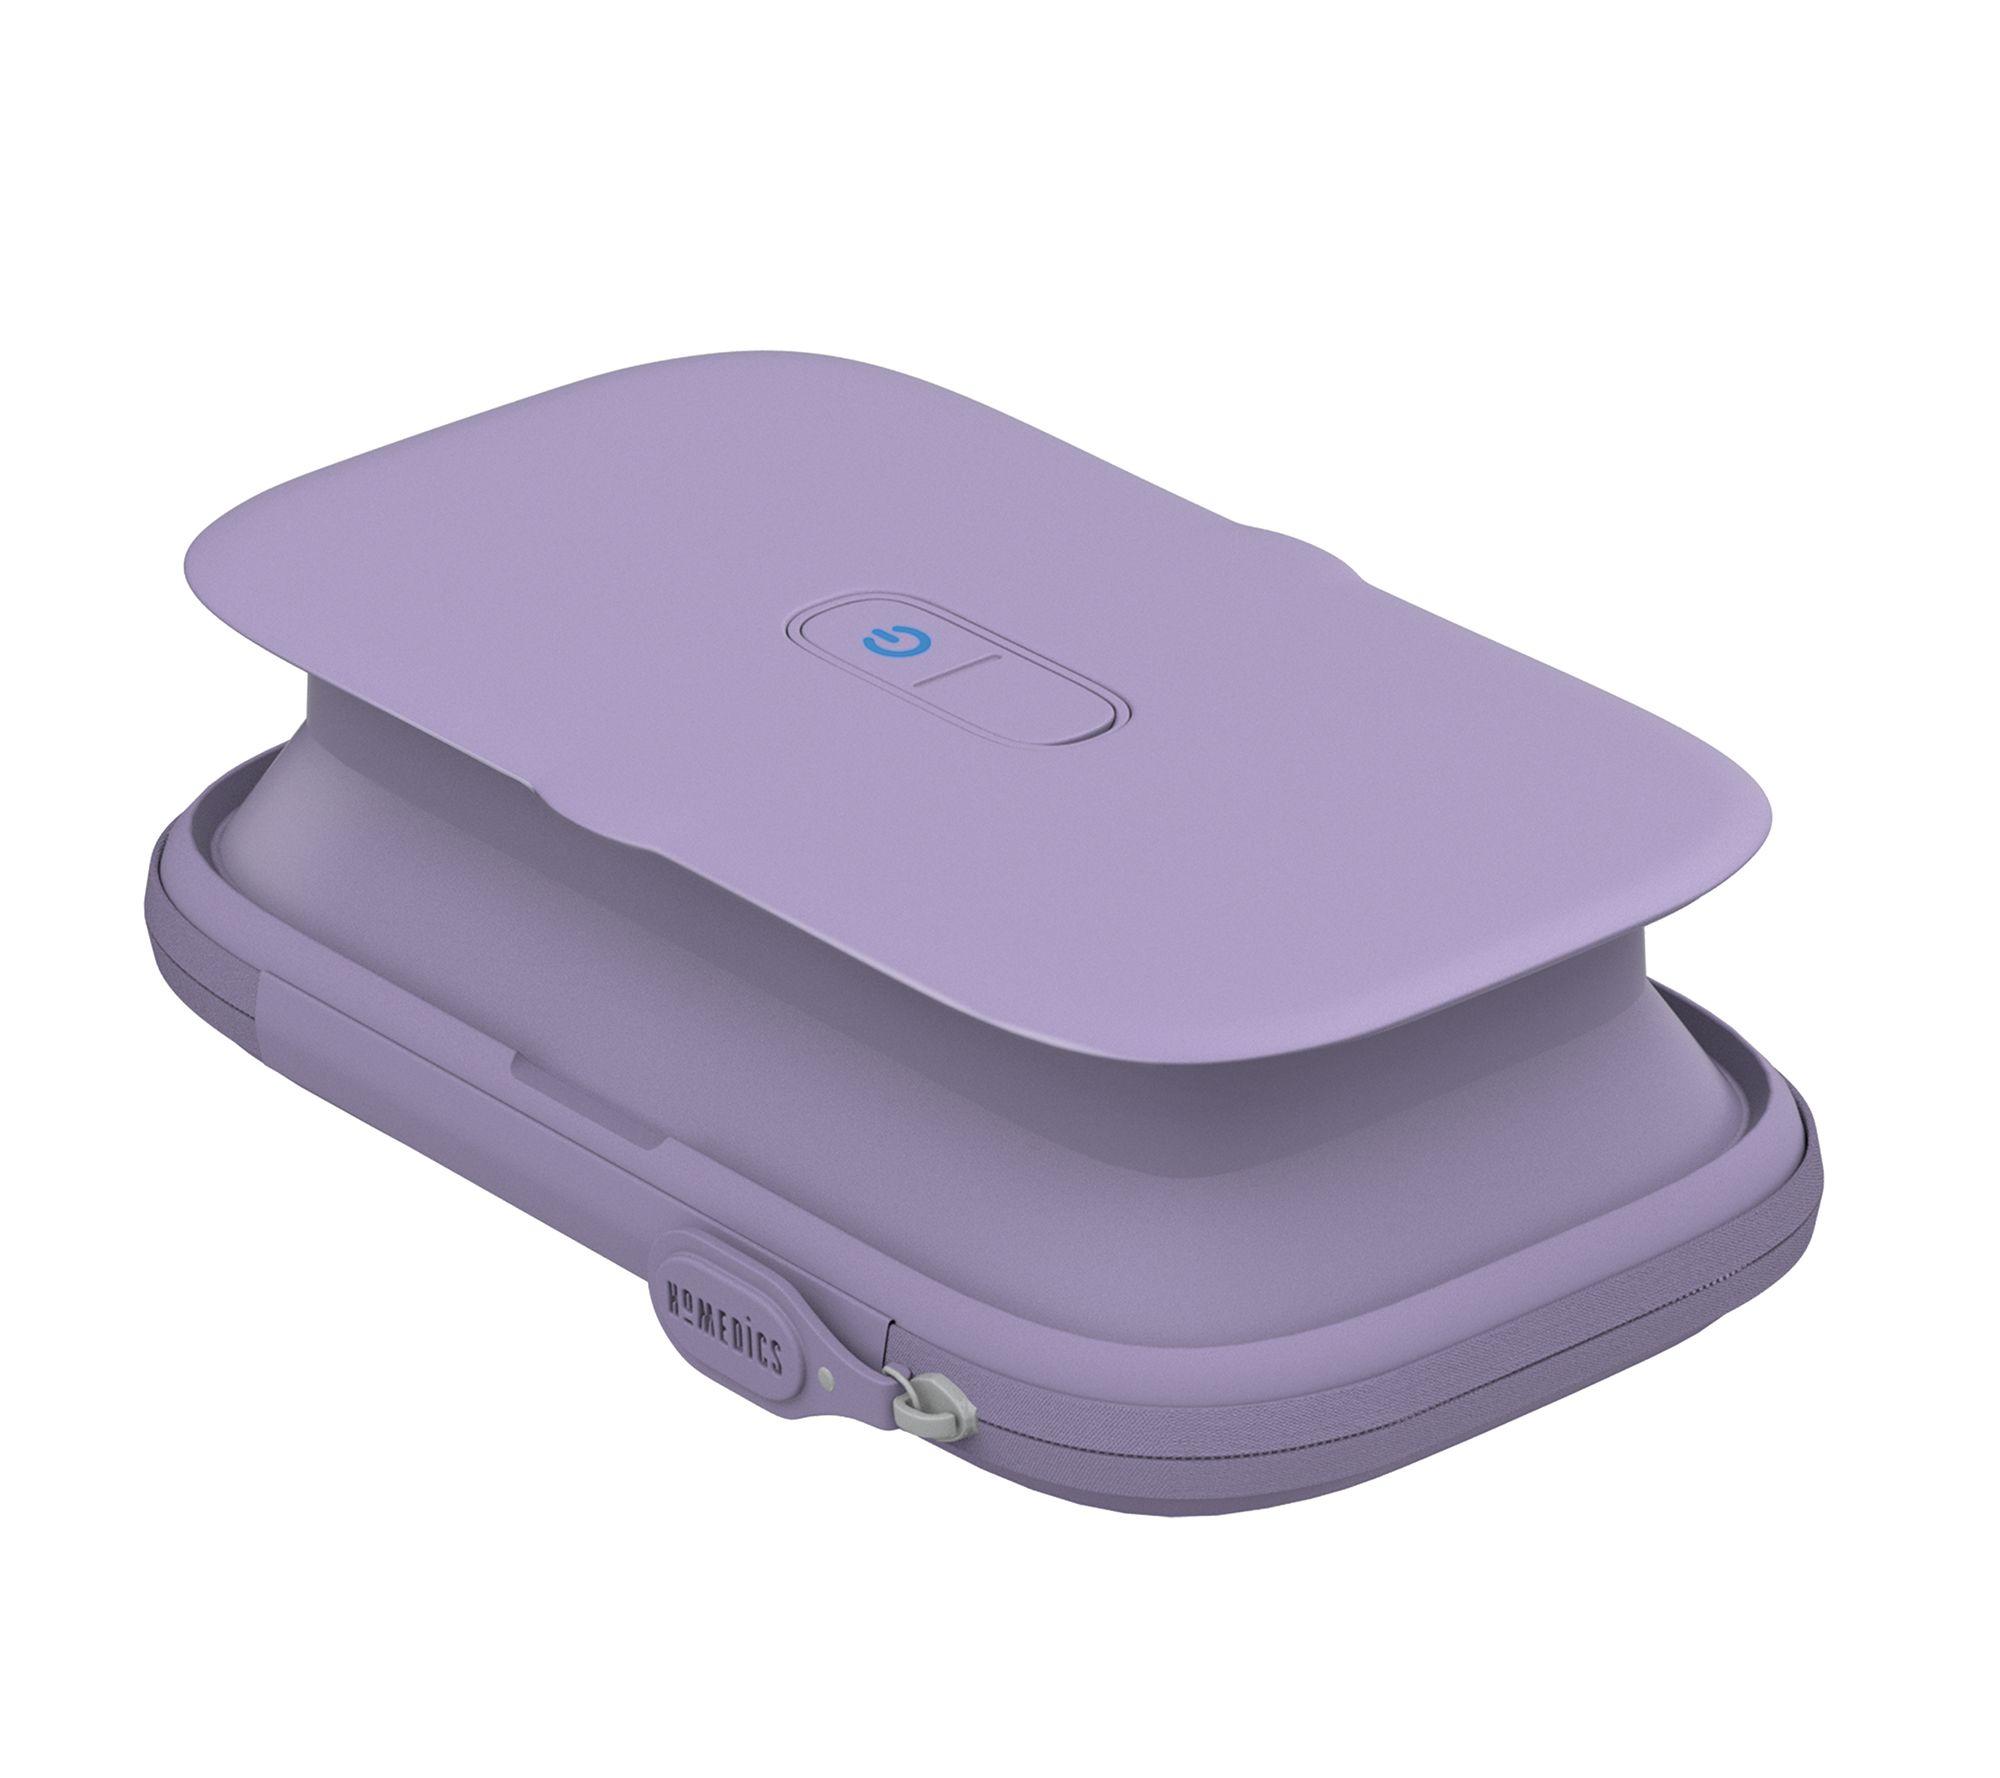 HoMedics UV Clean Pop-up On-the-Go Phone Sanitizer Case - QVC.com